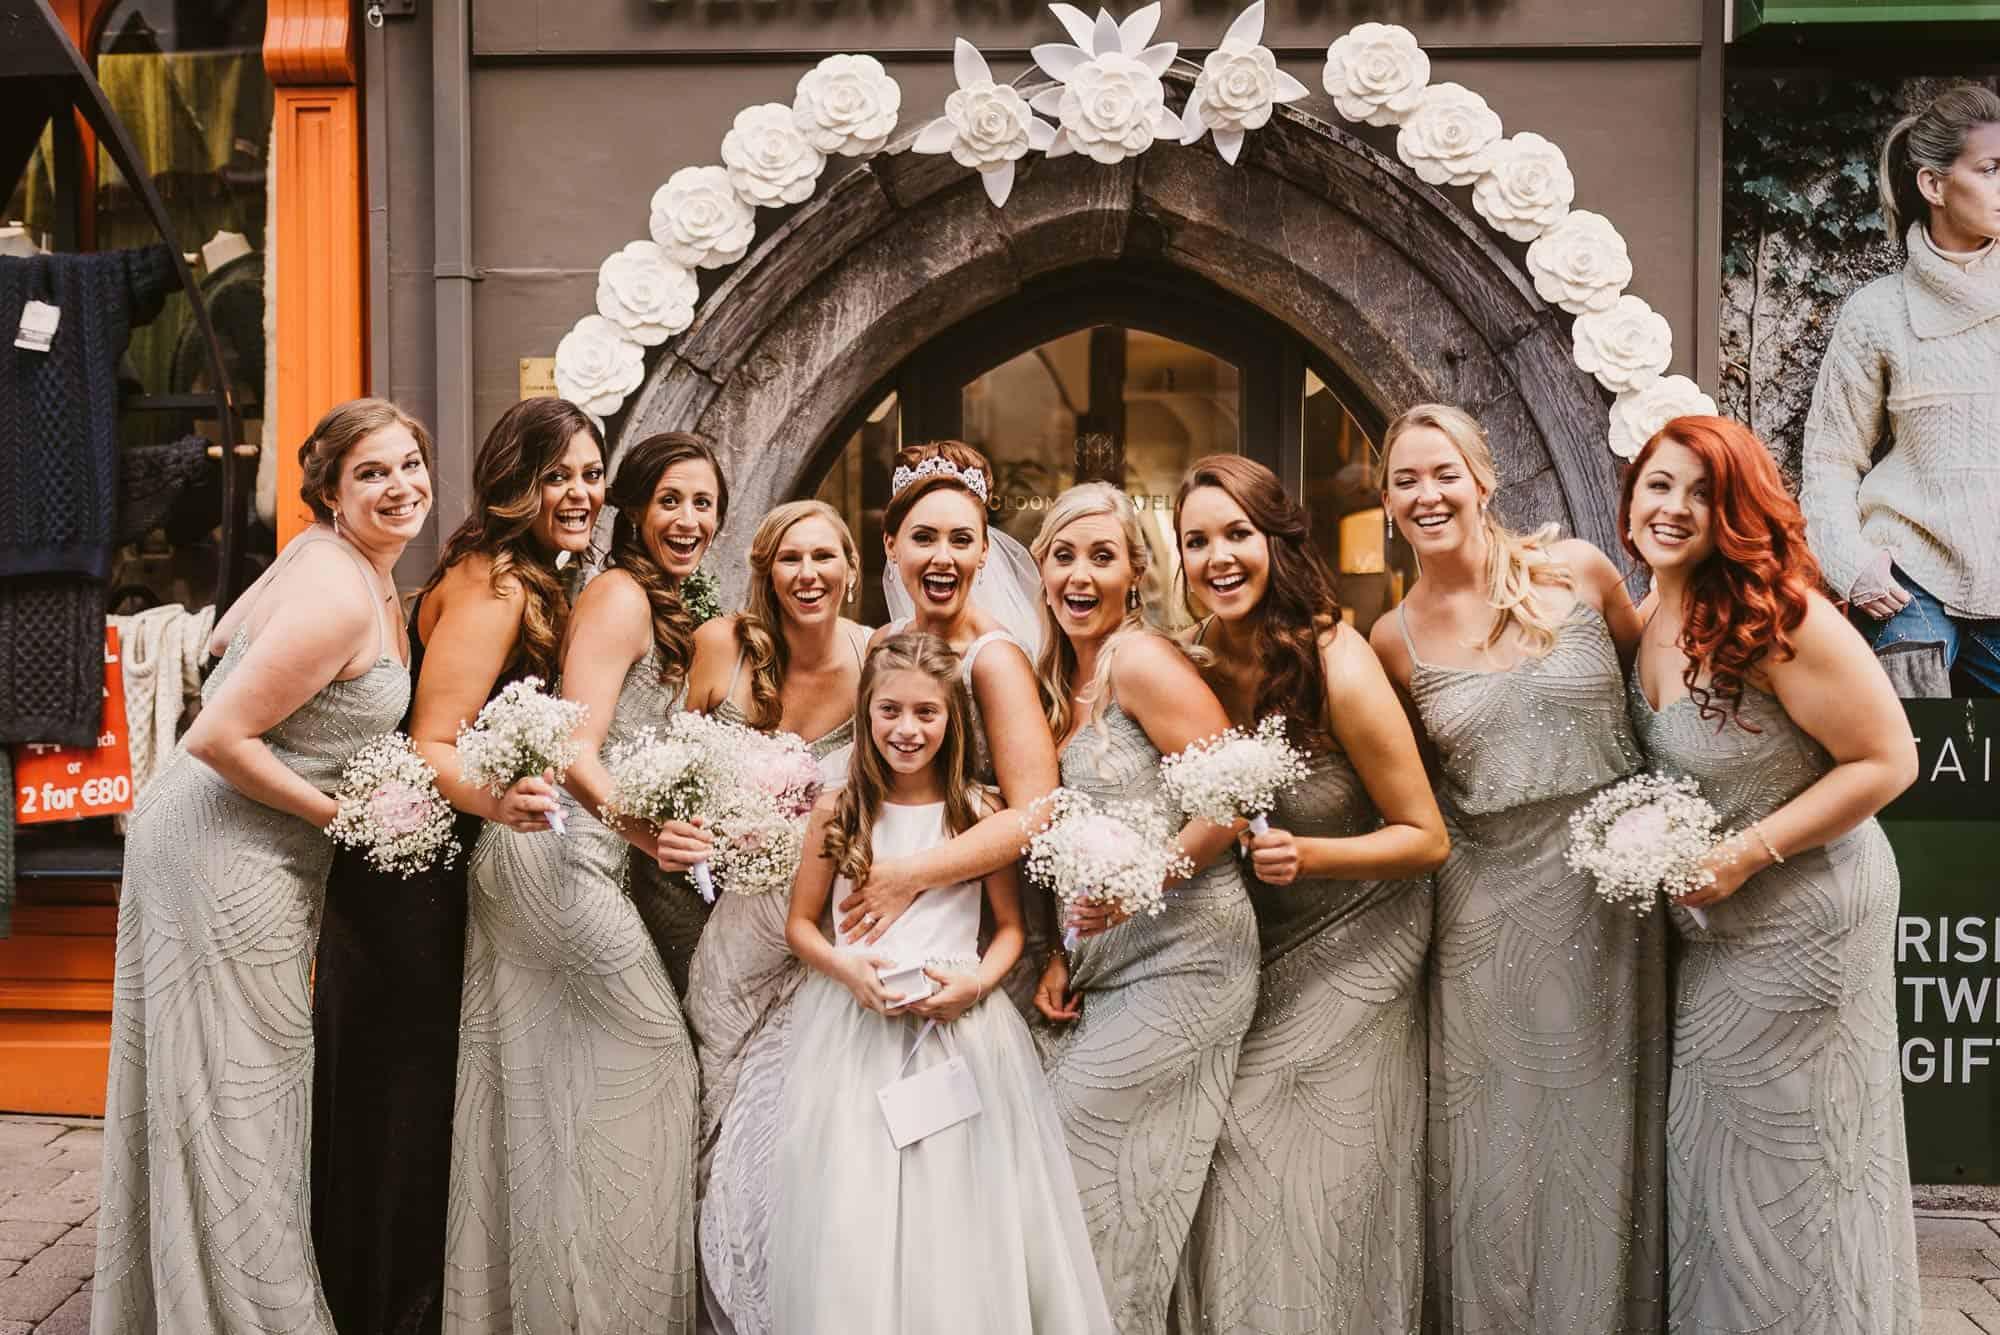 Wedding photography Ireland The Girls